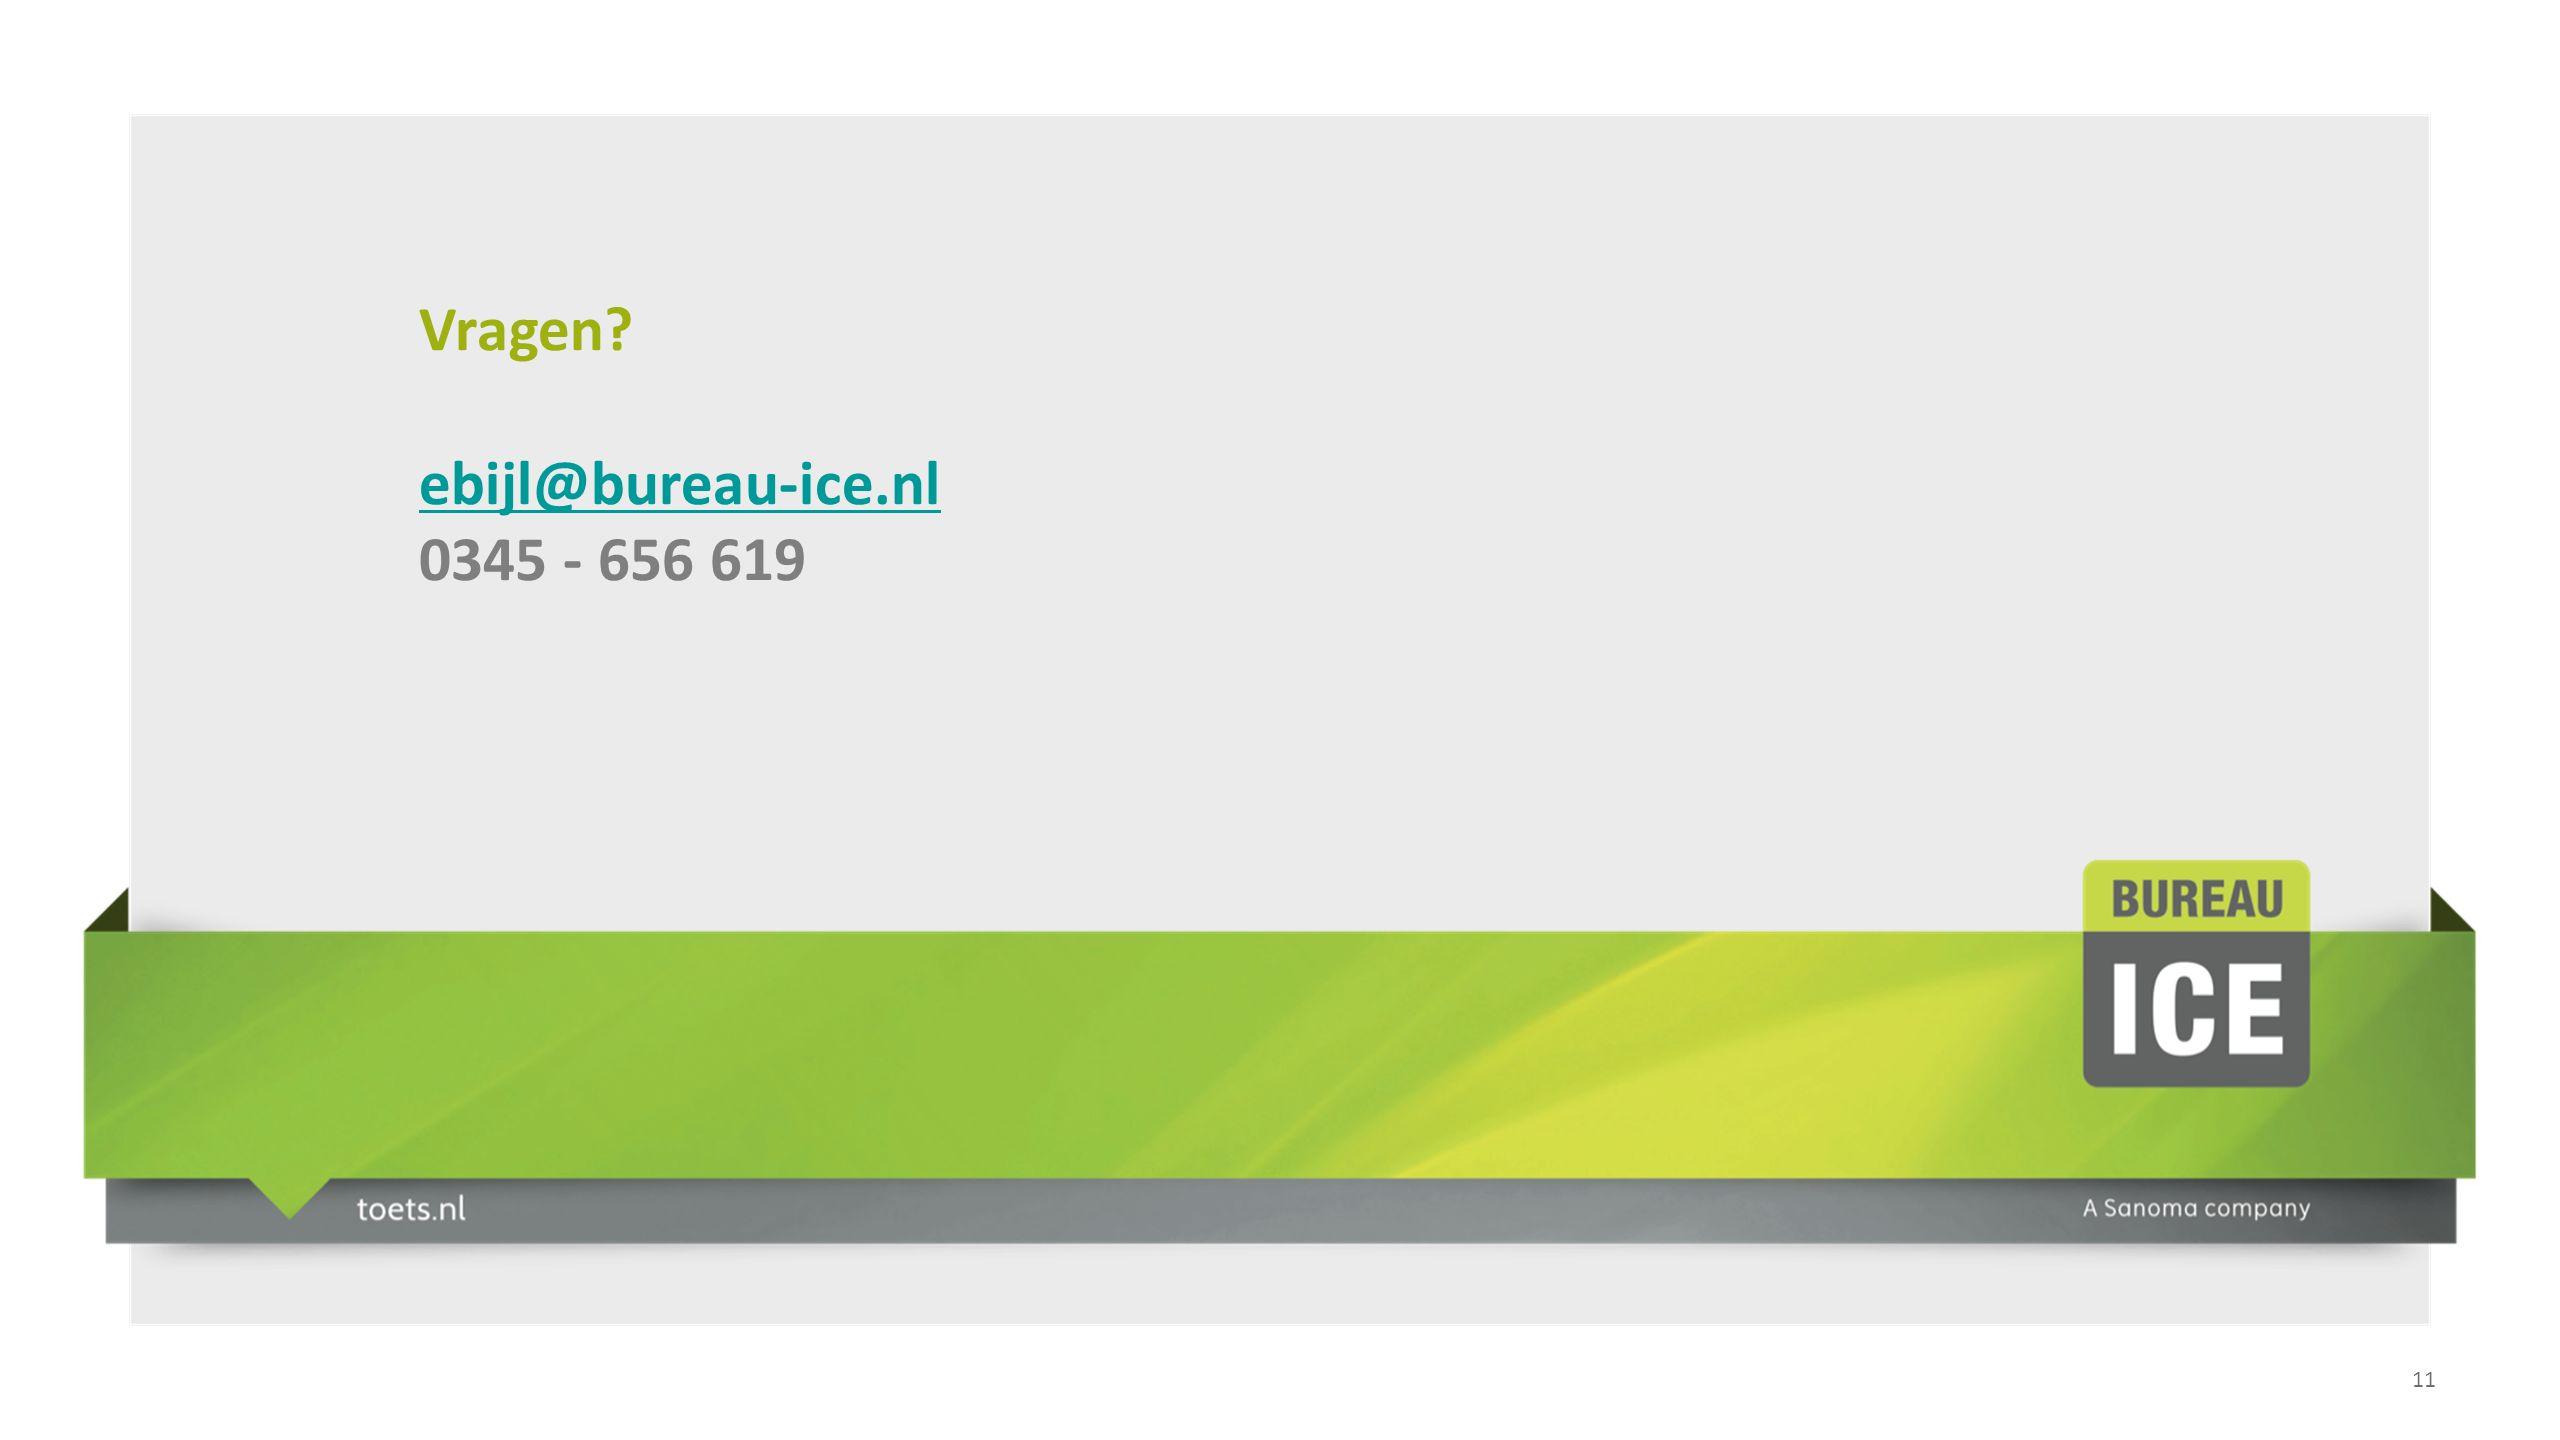 11 Vragen ebijl@bureau-ice.nl 0345 - 656 619